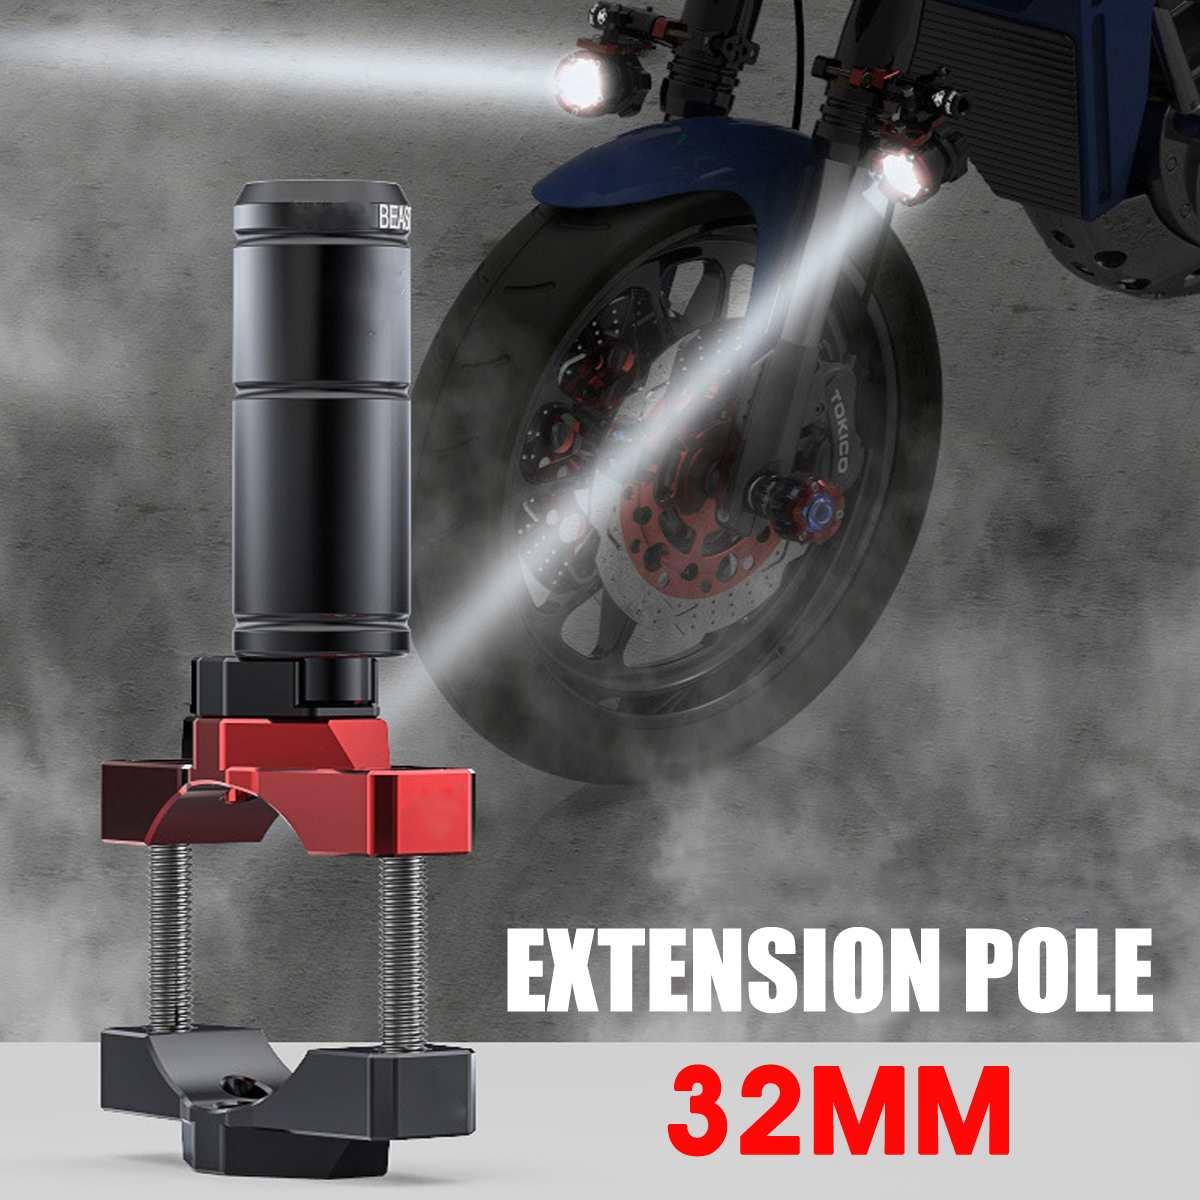 CNC Headlight Mount Bracket Extension Pole Motorcycle ATV Spot Lamp Holder Universal Bracket Spotlight Modification Accessories